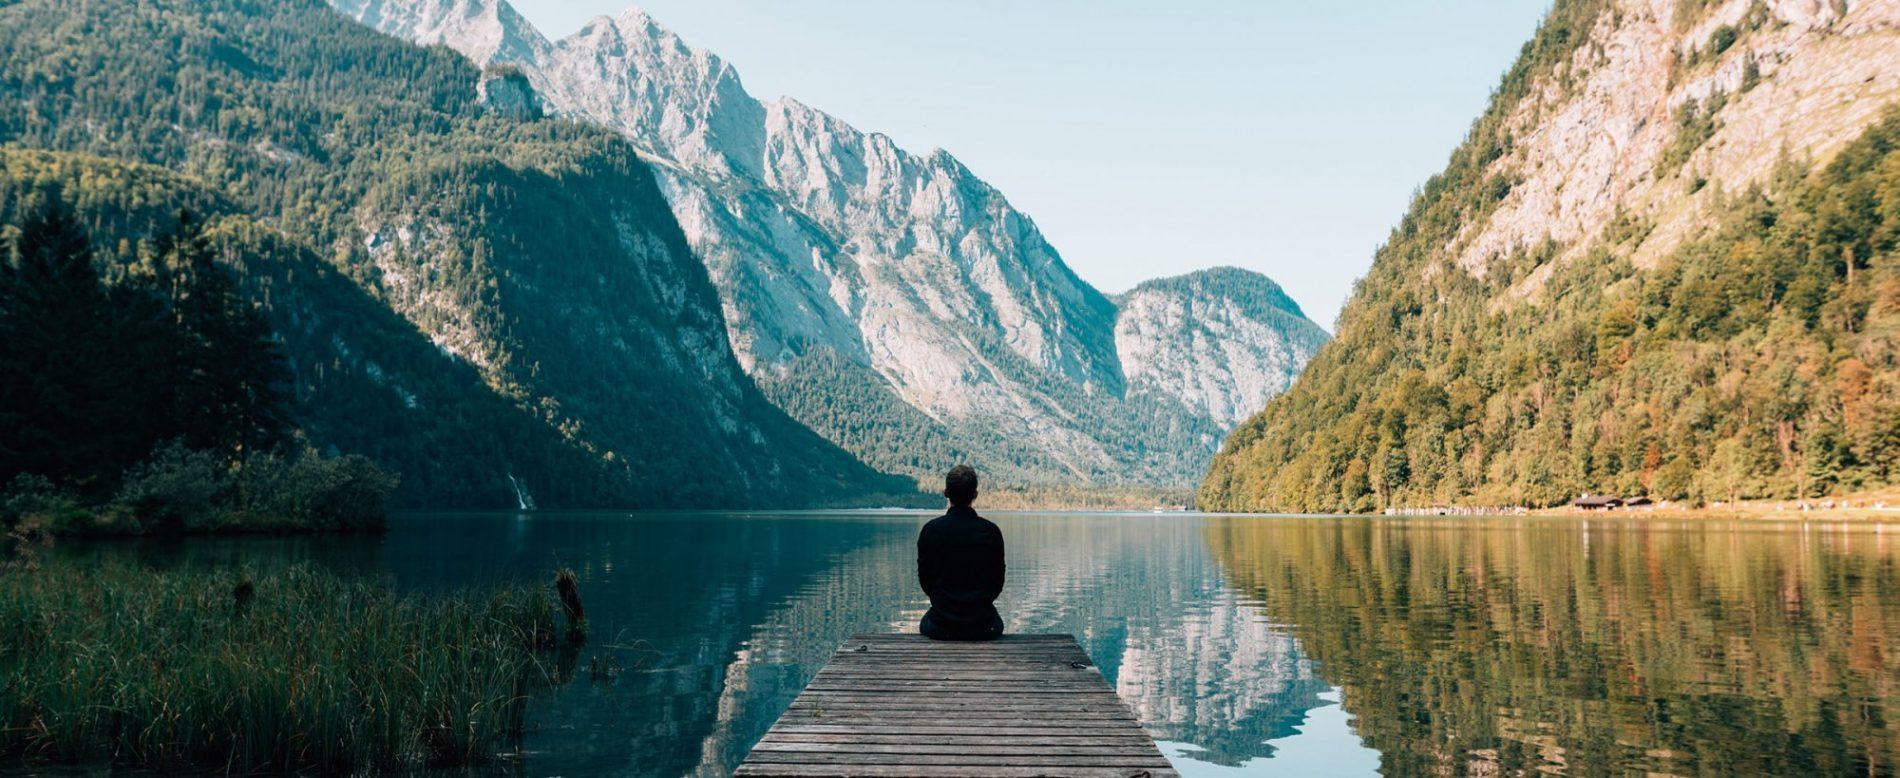 Ser humilde después del éxito